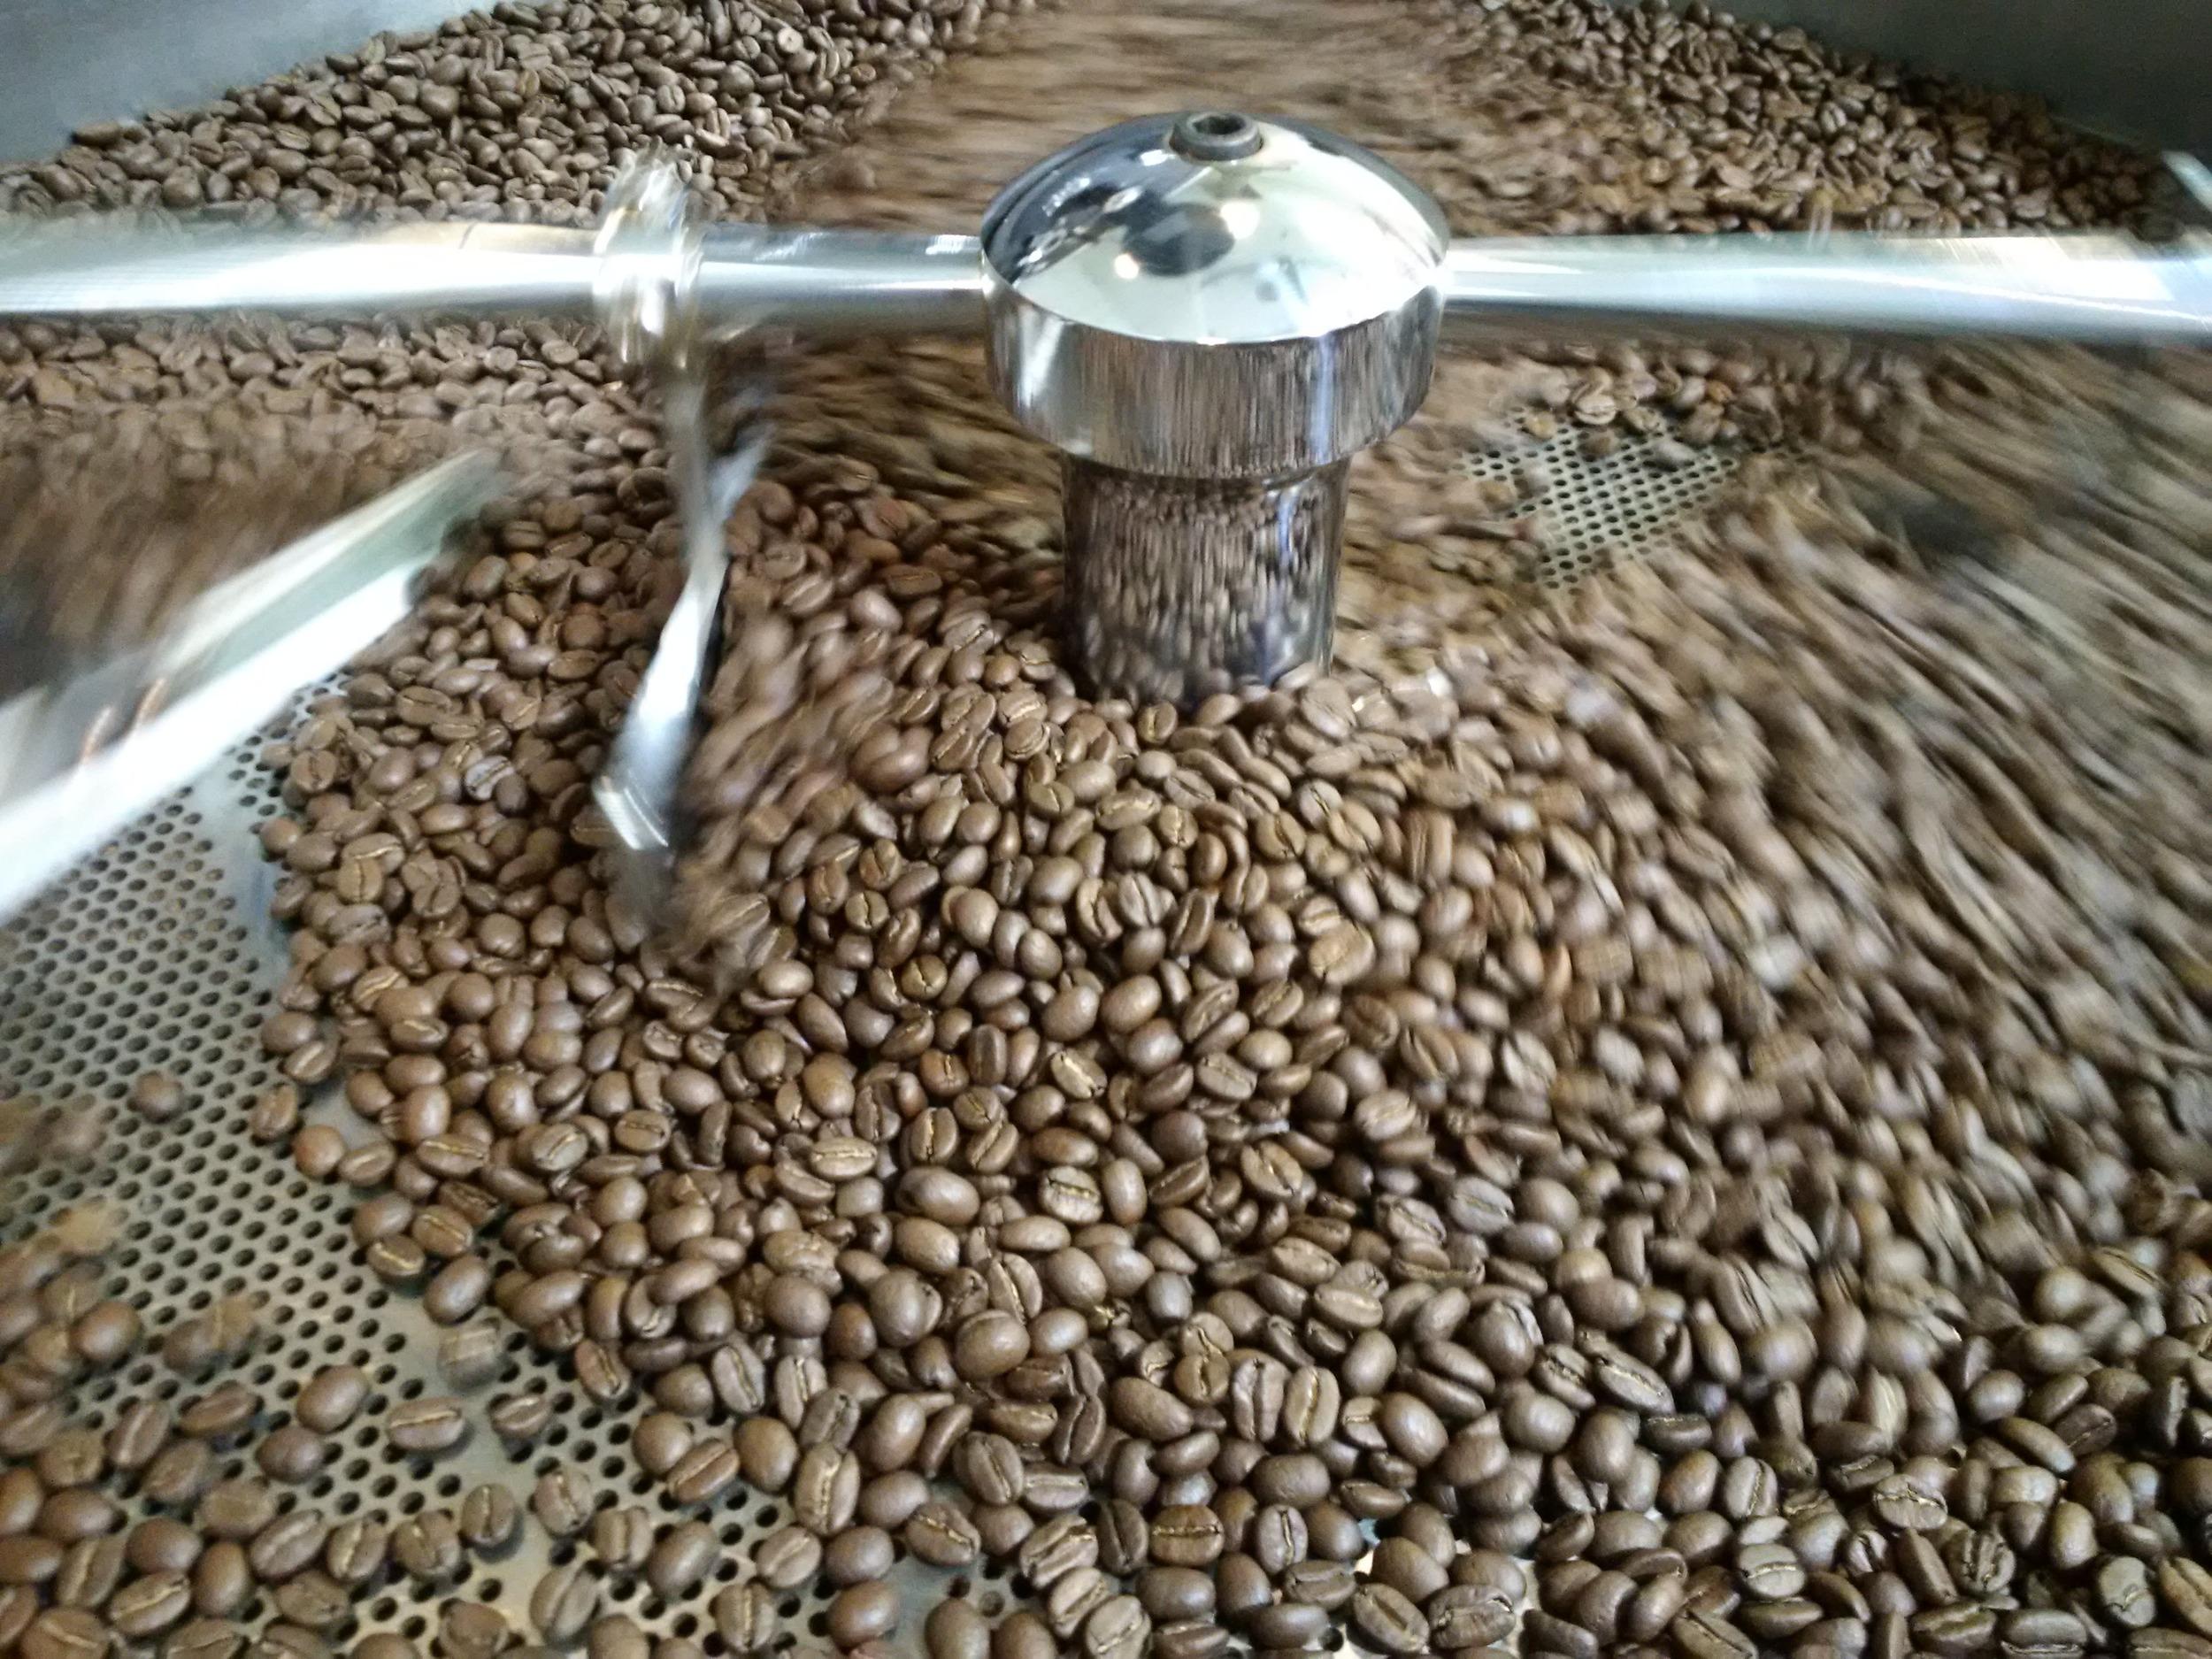 cooling coffee.jpg